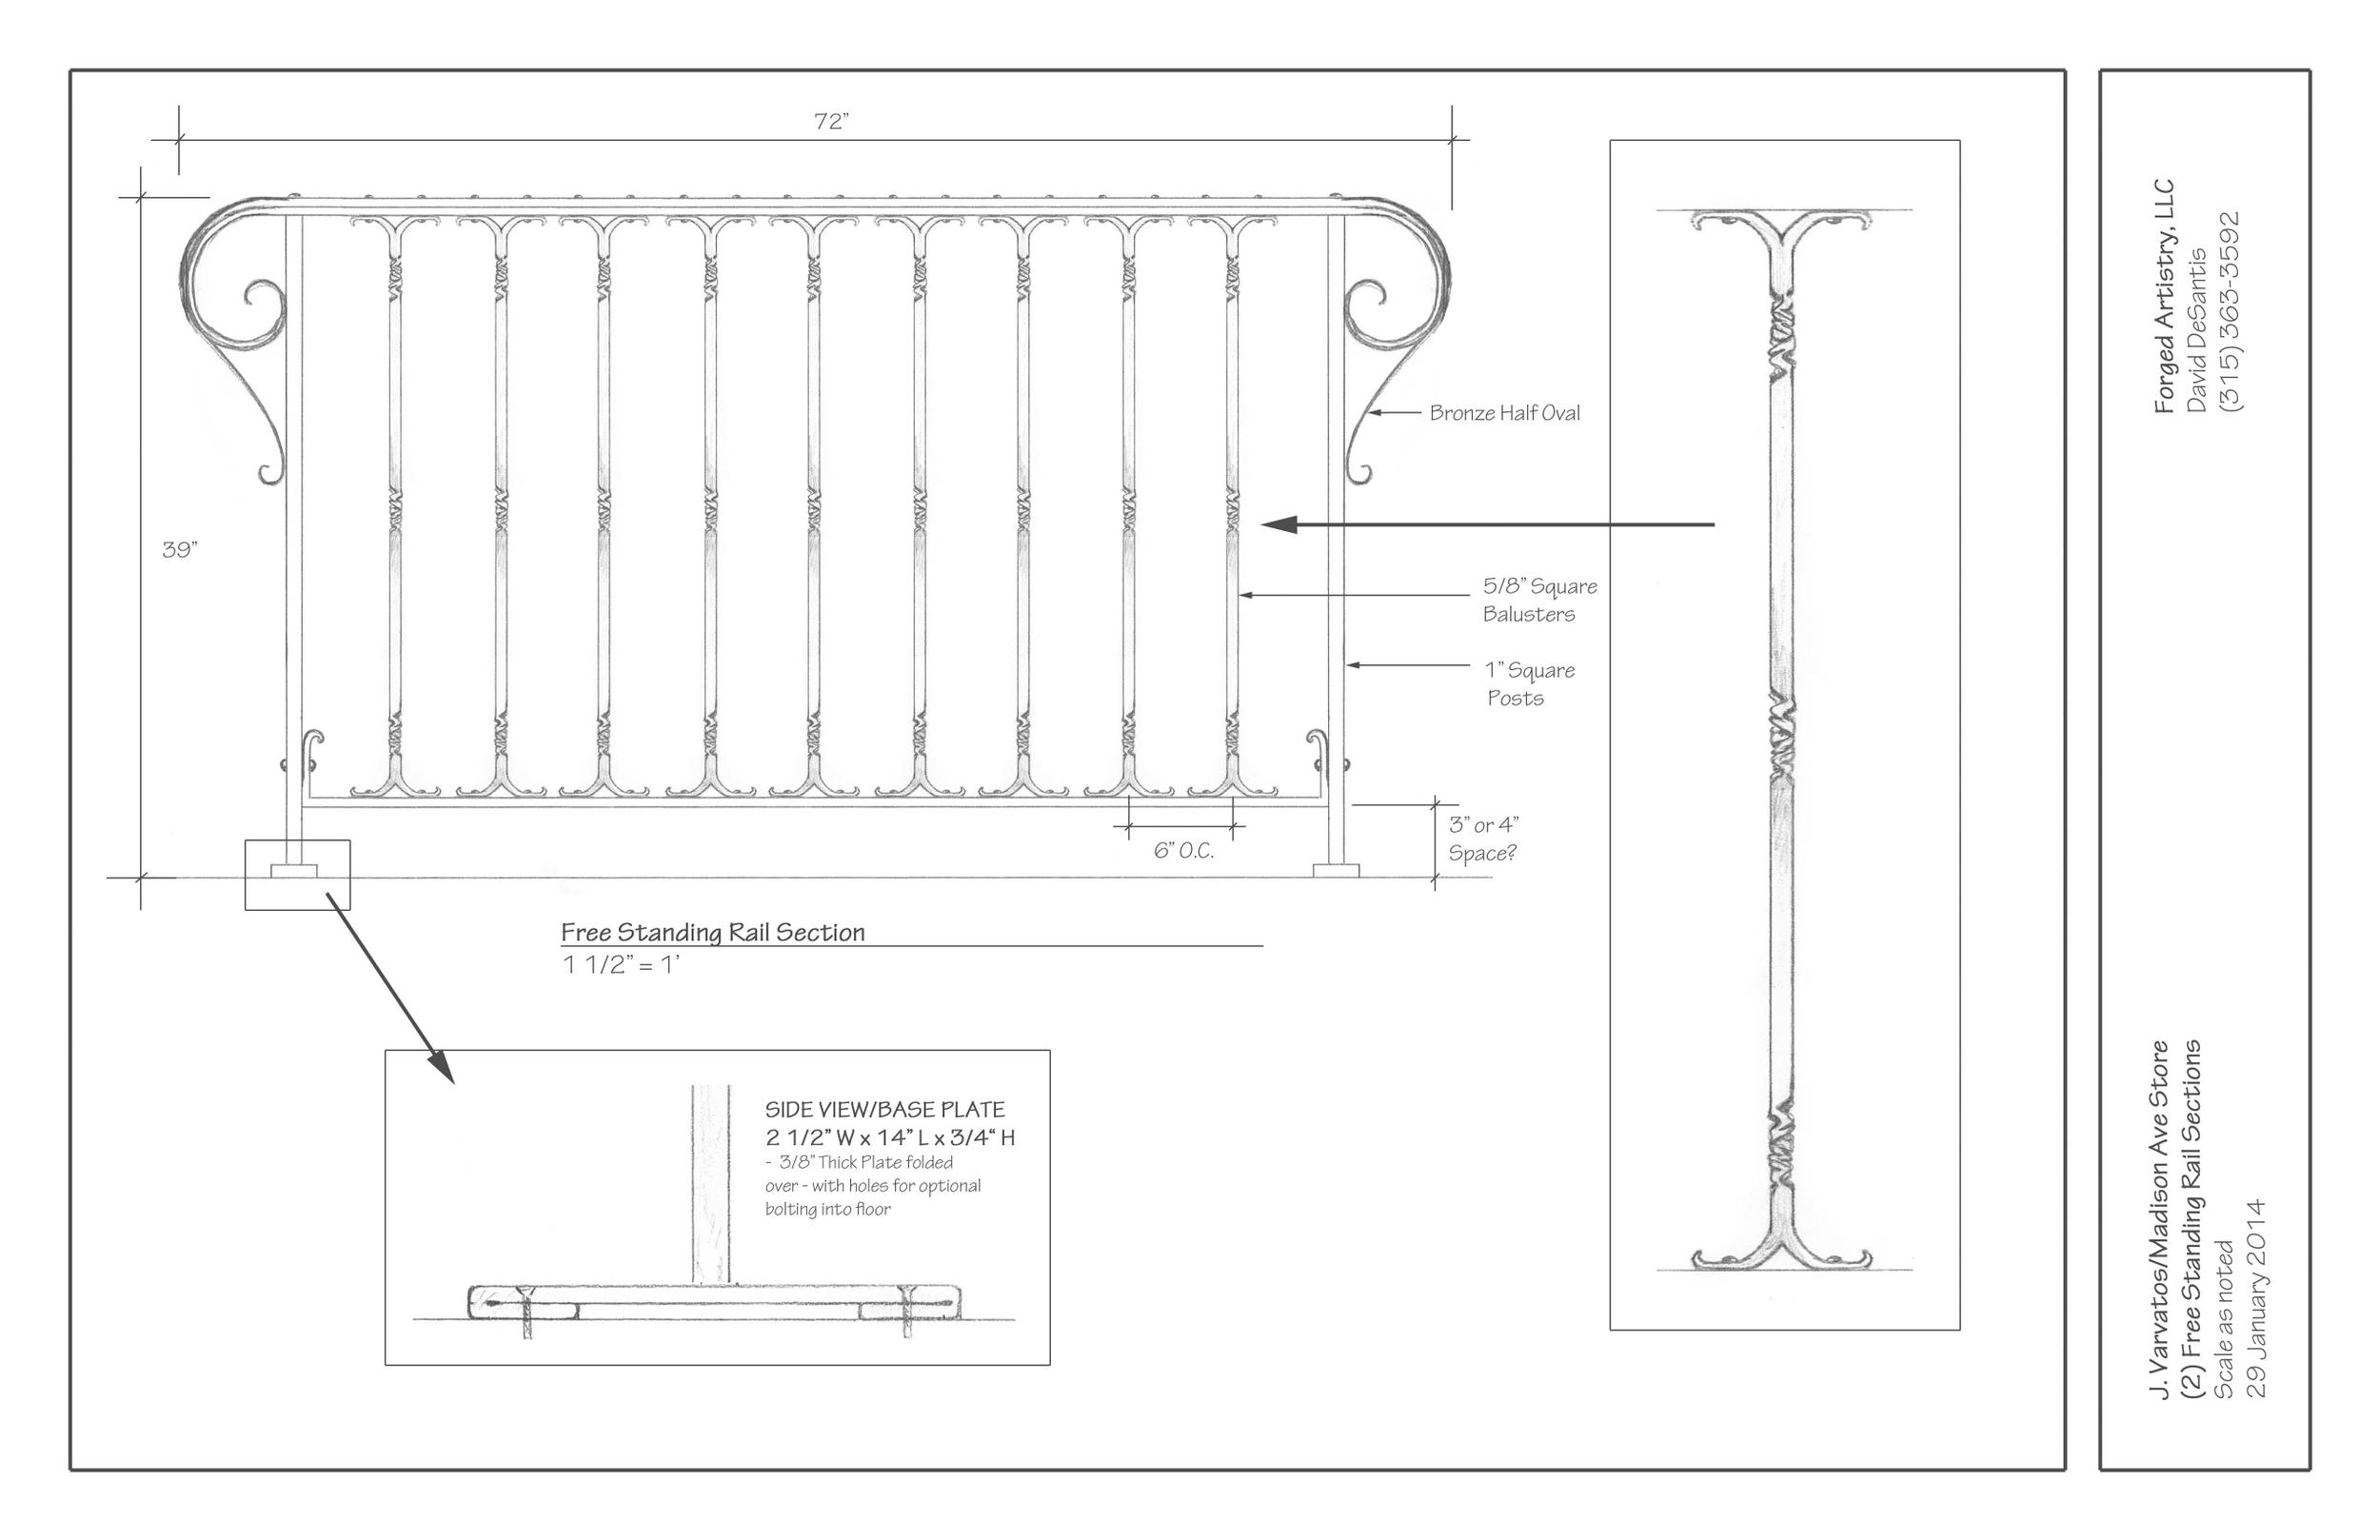 JV Free Standing Rail Section copy.jpg